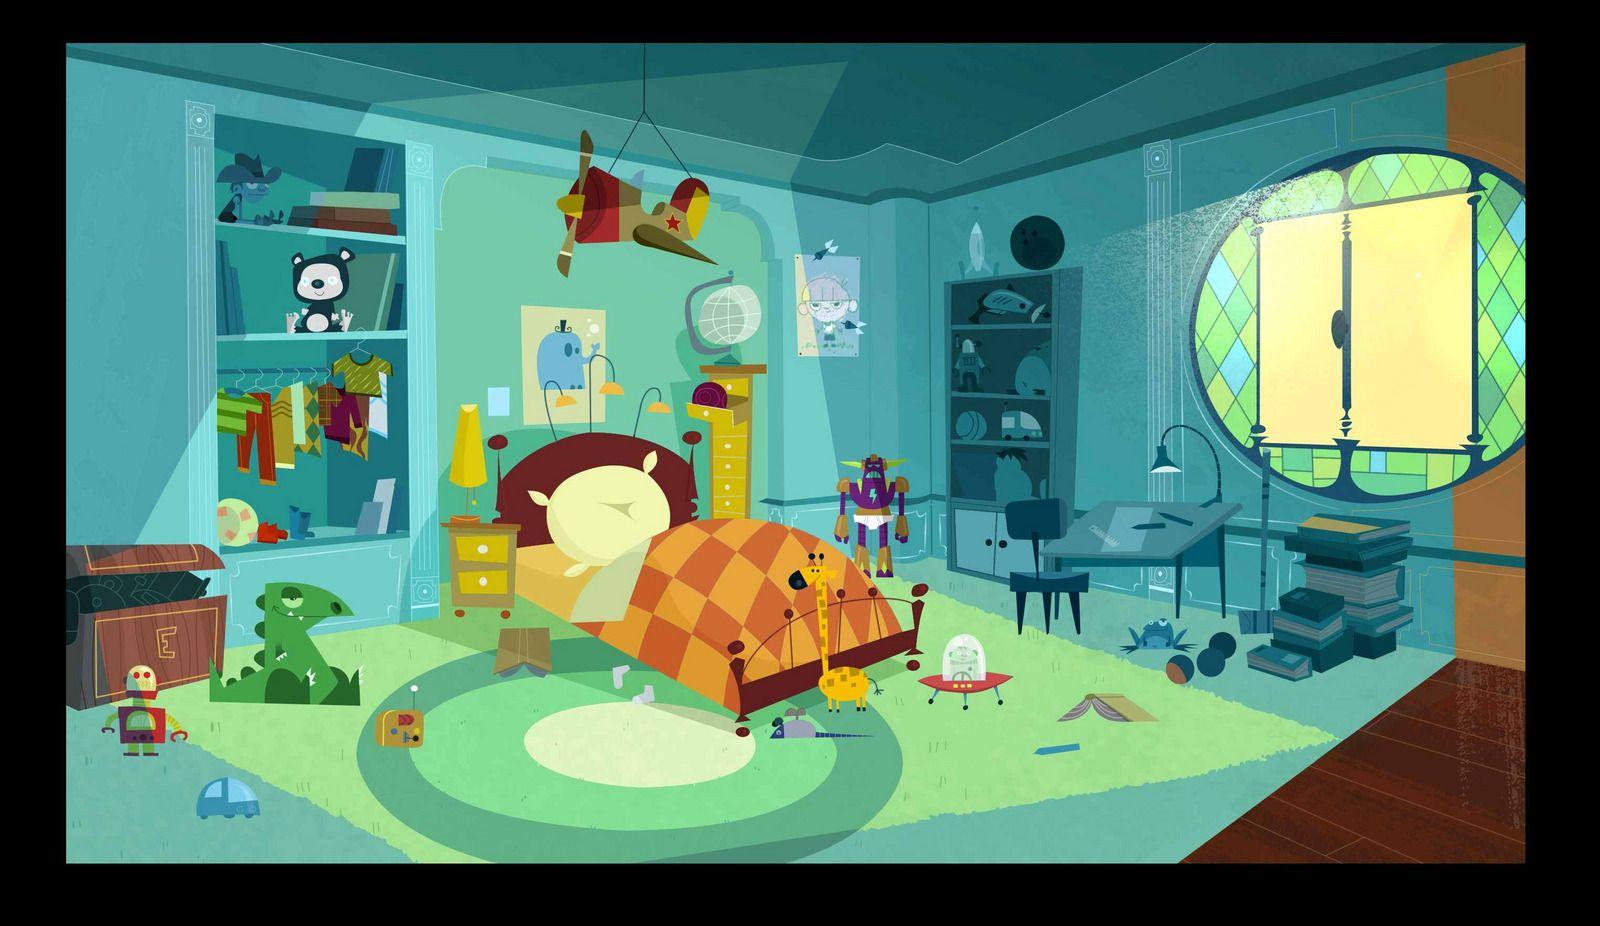 1600x926 14853 eliot kidd 2d illustration room interior for 2d room design